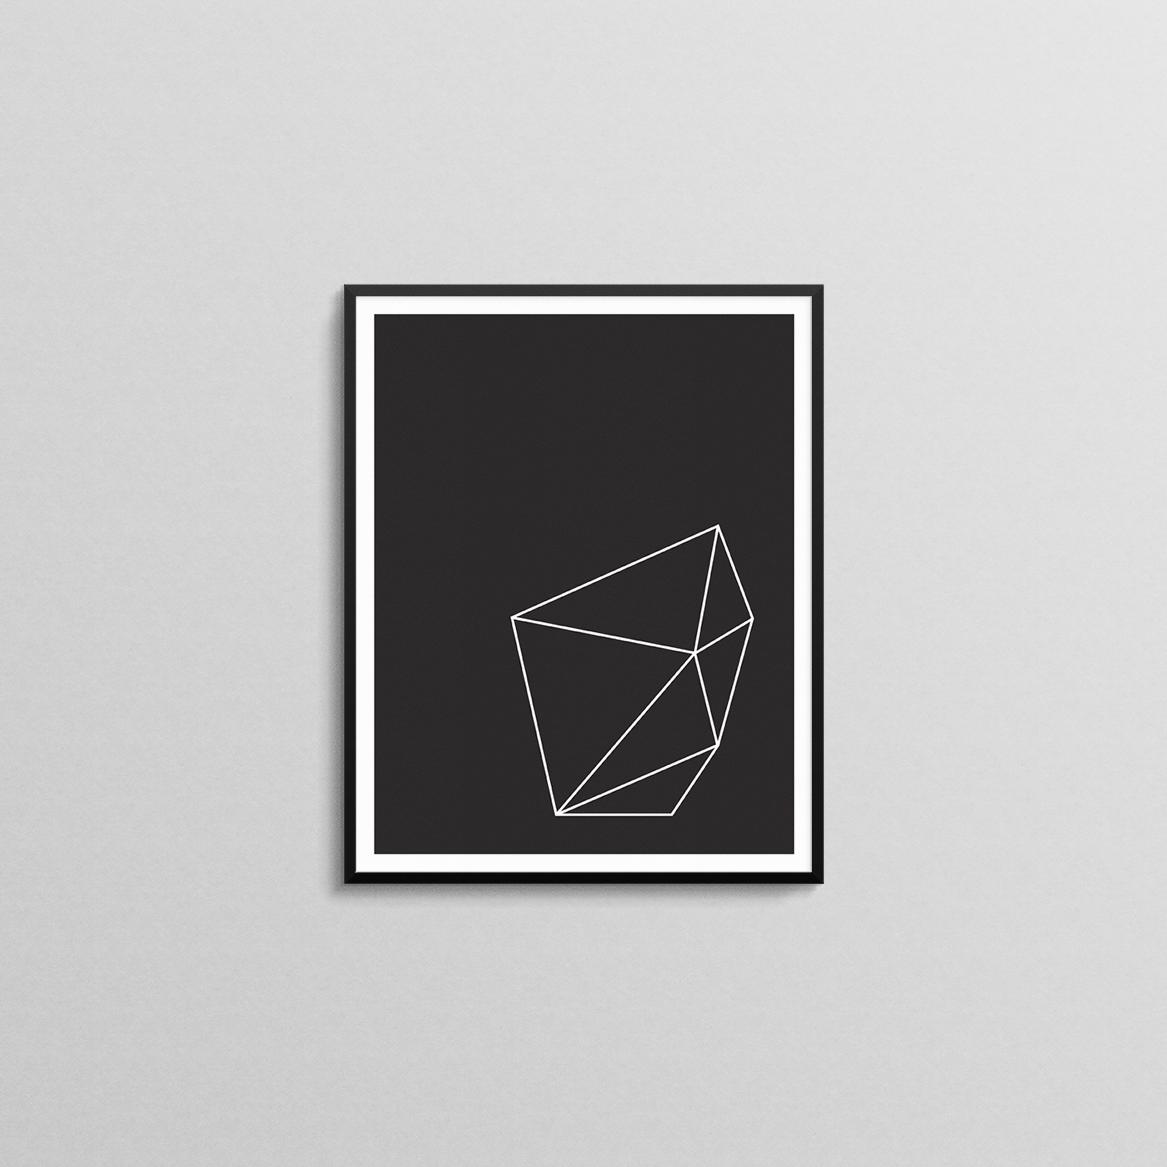 Black and White Geometric Shape